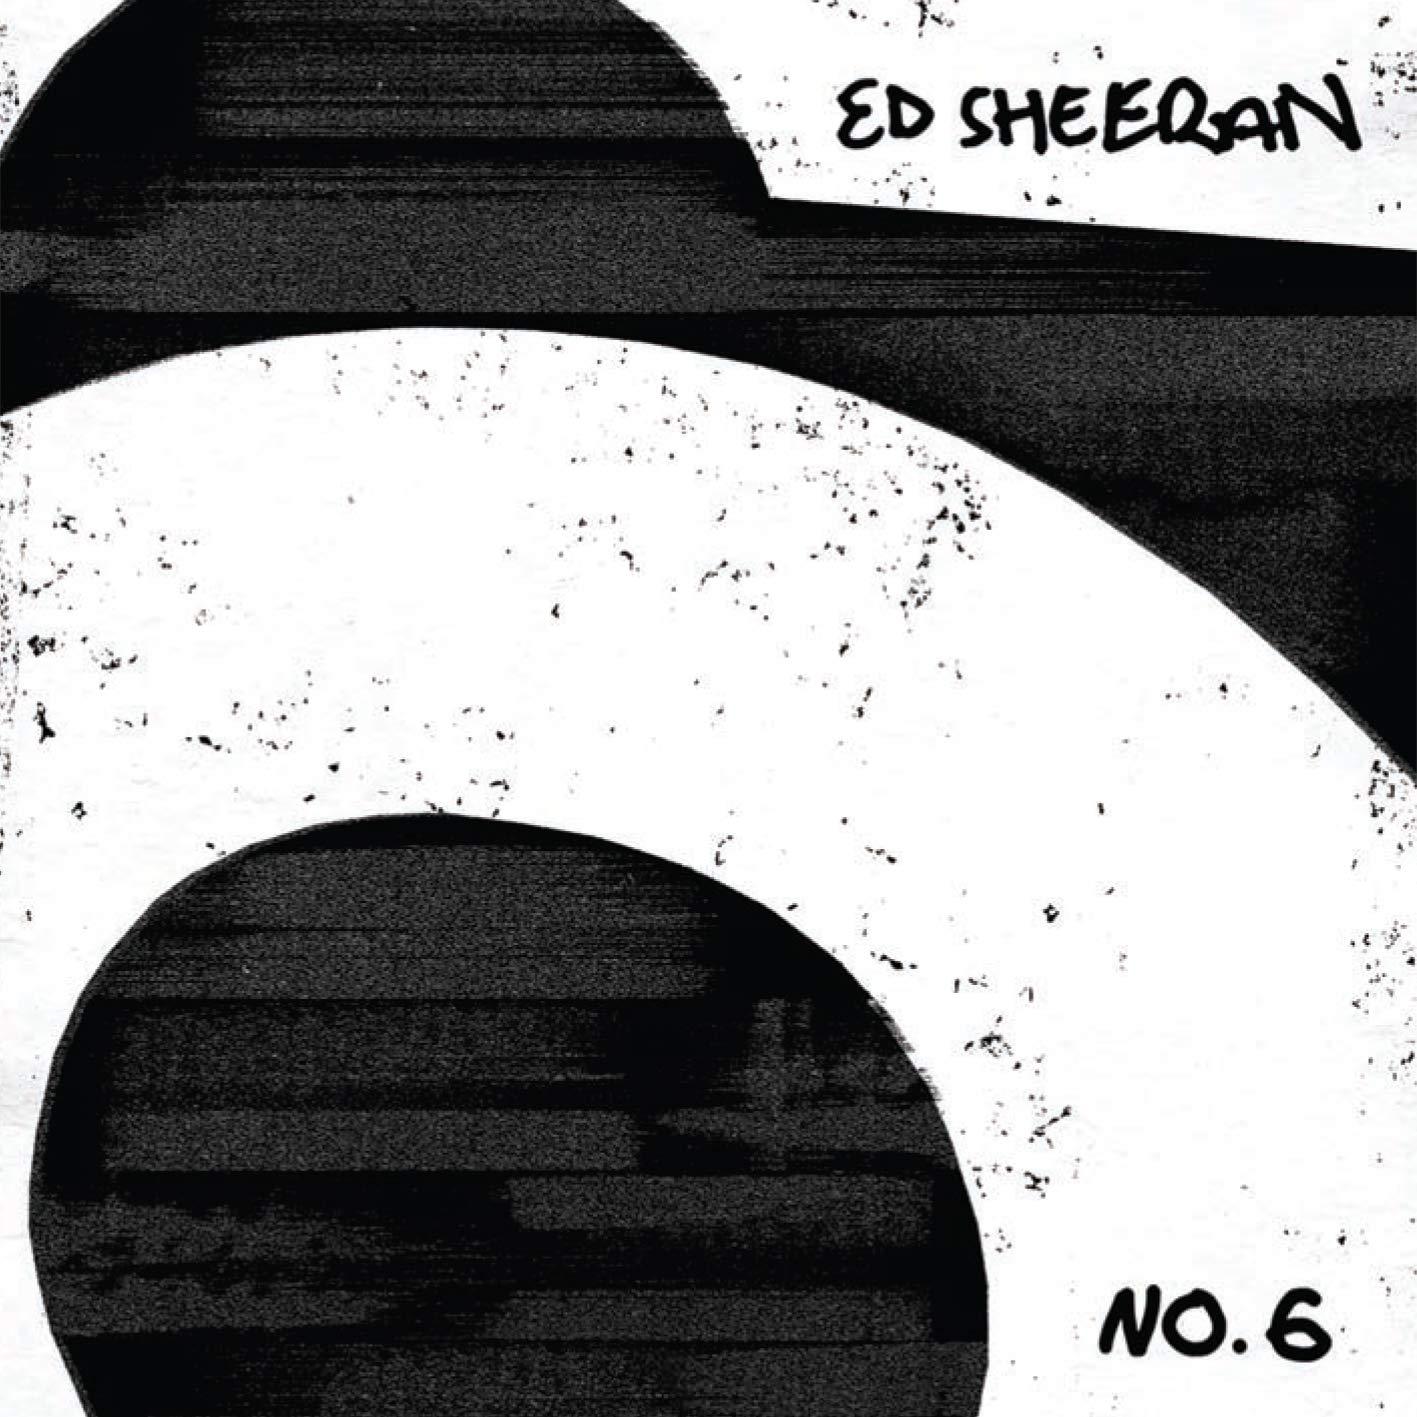 Ed Sheeran - No. 6 Collaborations Project - CD /plast/